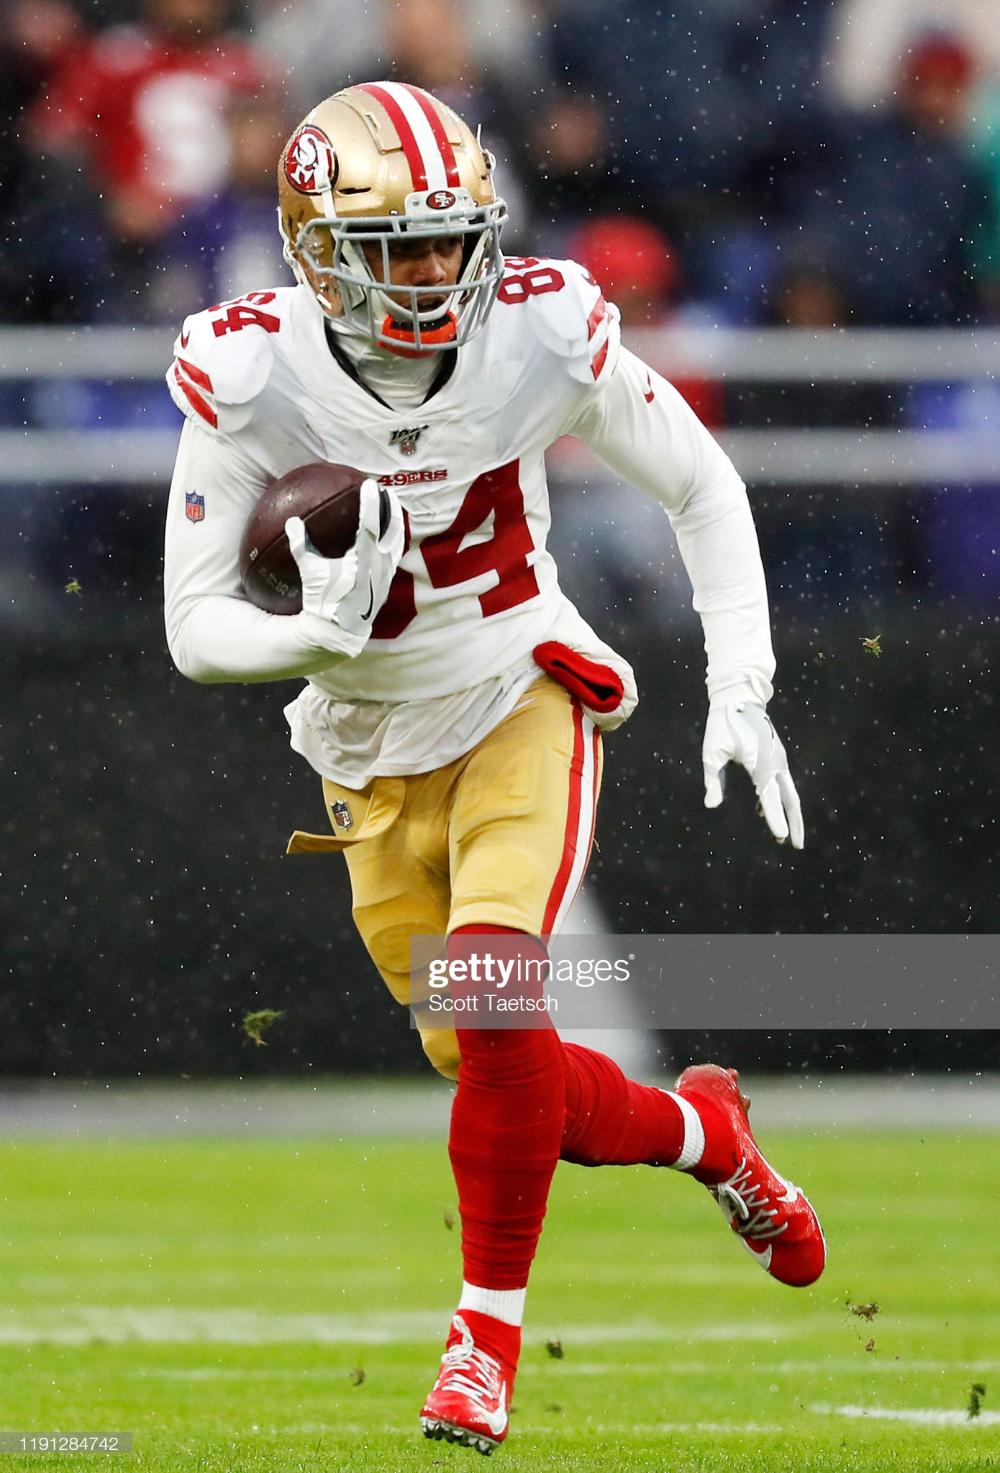 Kendrick Bourne Of The San Francisco 49ers Runs With The Ball During San Francisco 49ers San Francisco 49ers Football 49ers